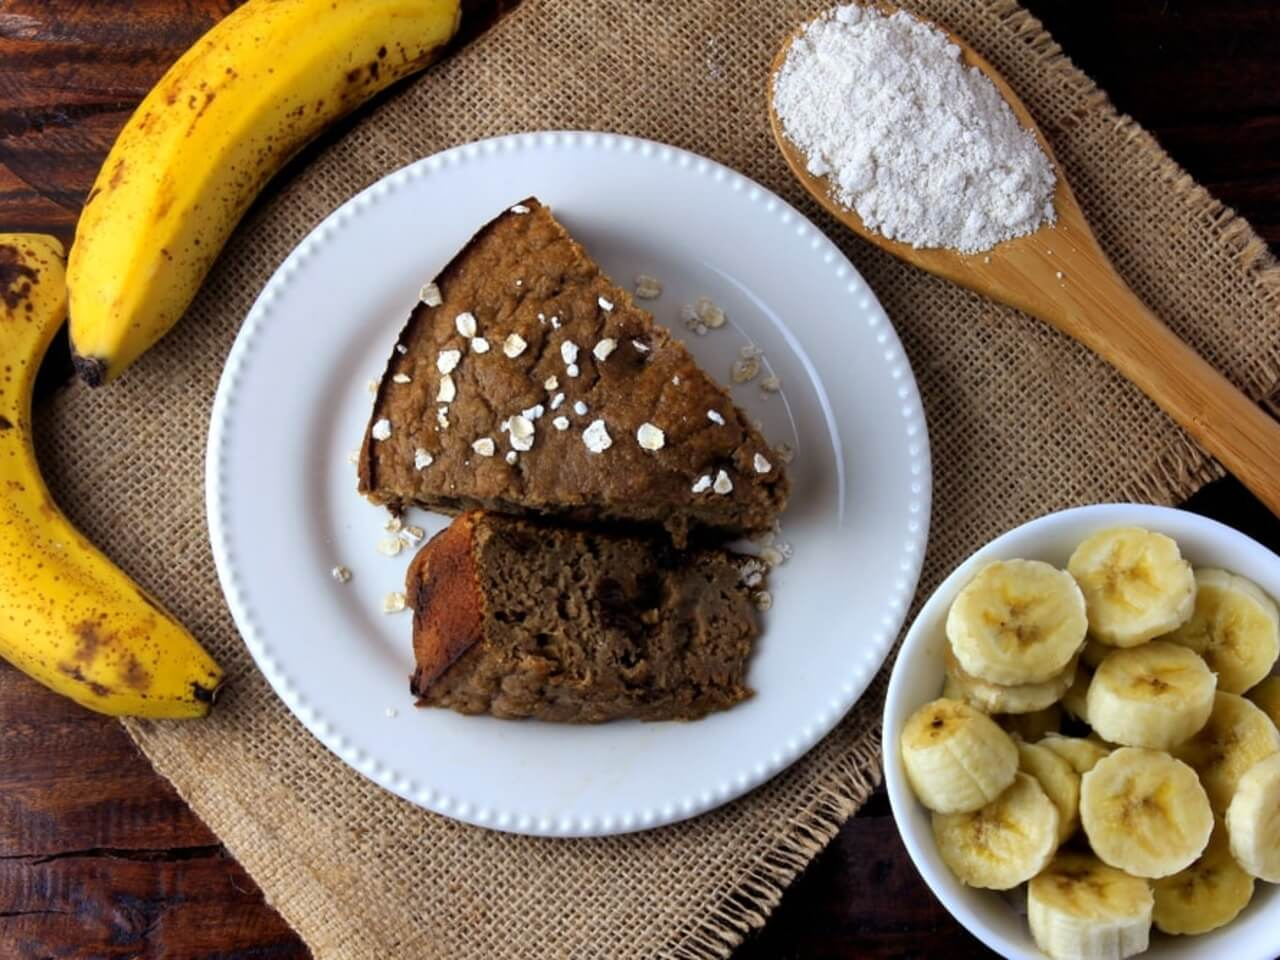 Vláčný banánový koláč s ovesnými vločkami